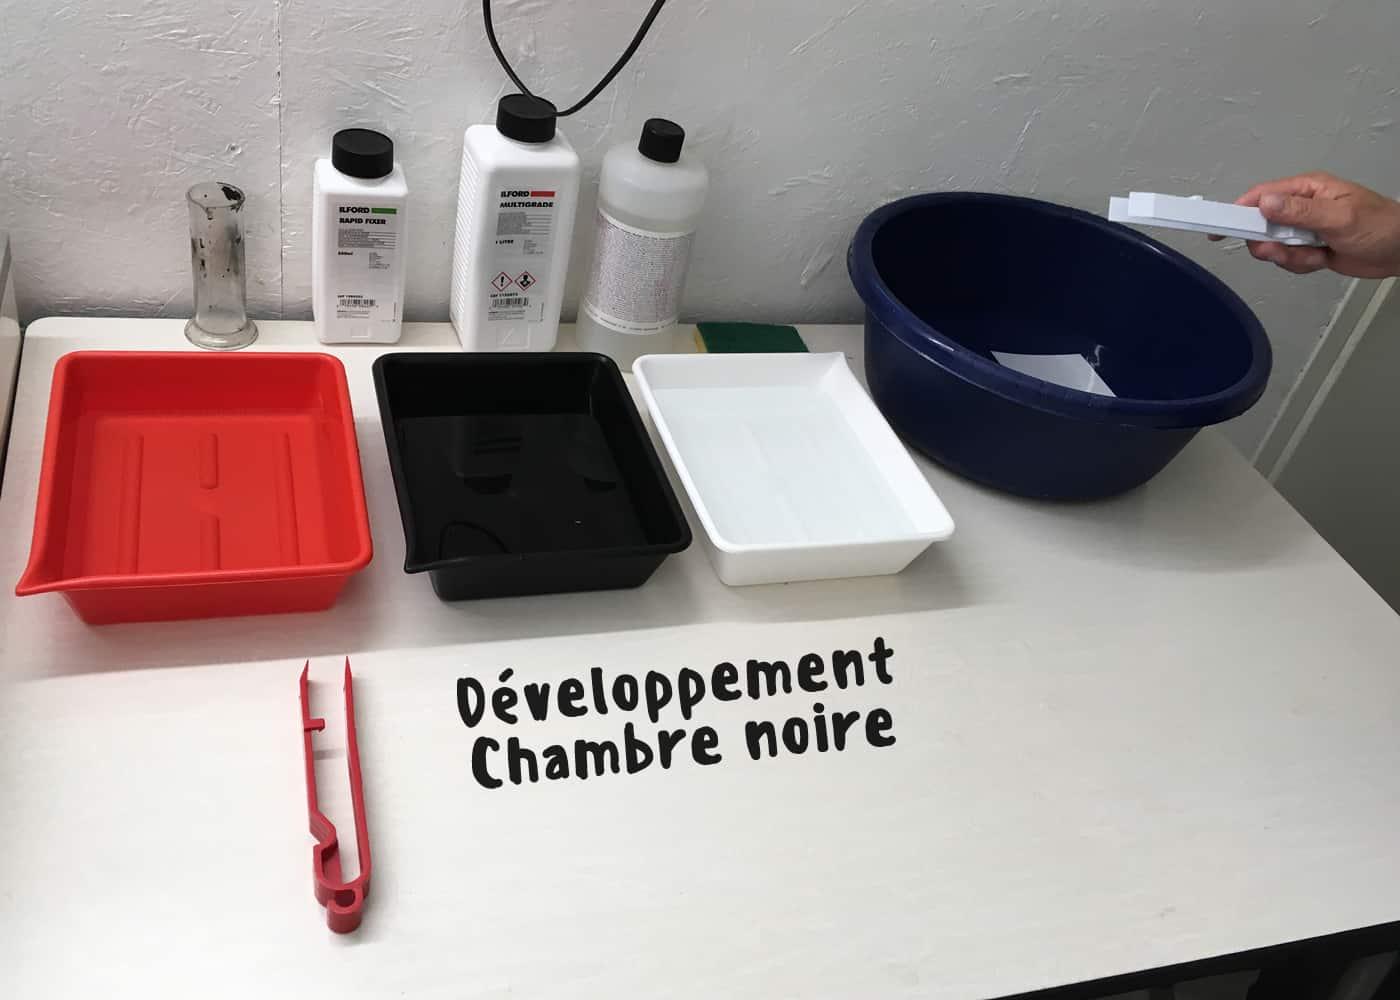 developpement-photo-stenope-workshop-ososphere-2017-avec-lassociation-creative-vintage